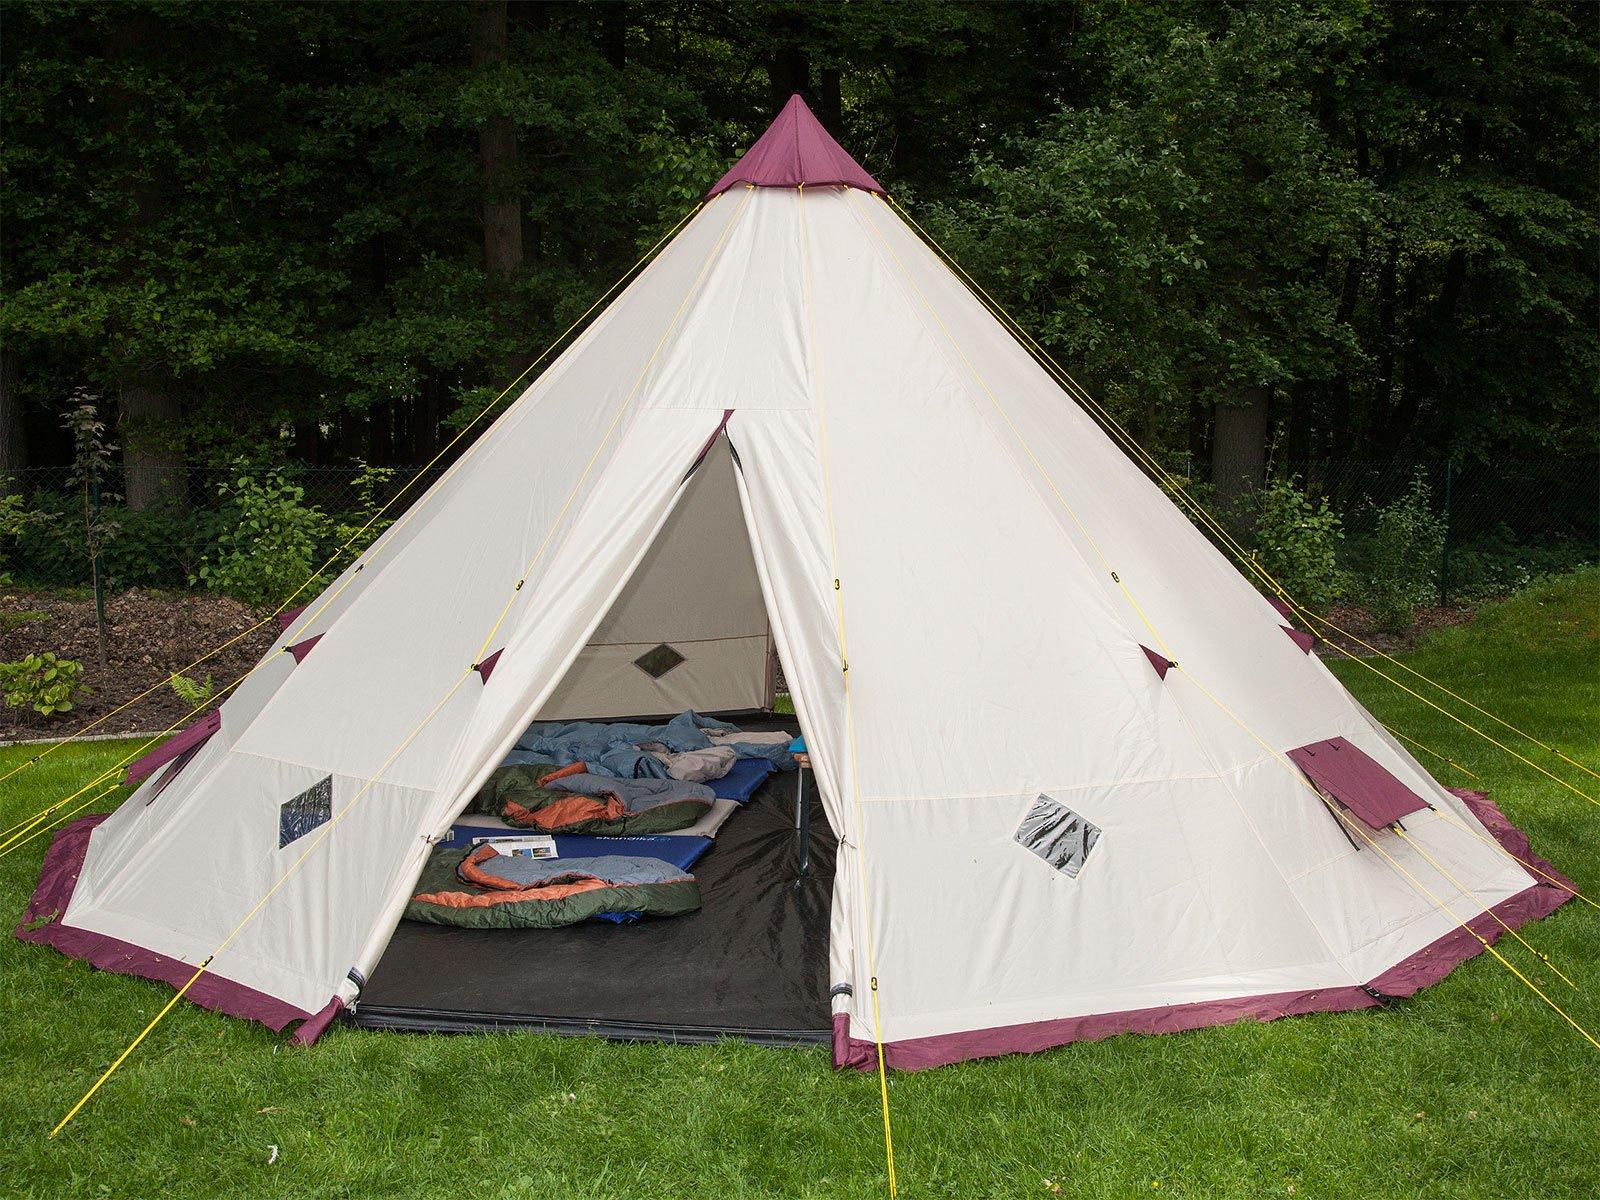 Skandika Teepee 301 Wigwam Style Indiana Tepee Tent, Sewn-In Groundsheet, 300 cm Peak Height, 3000 mm Water Column, Sand/Burgundy, 12-Person 2